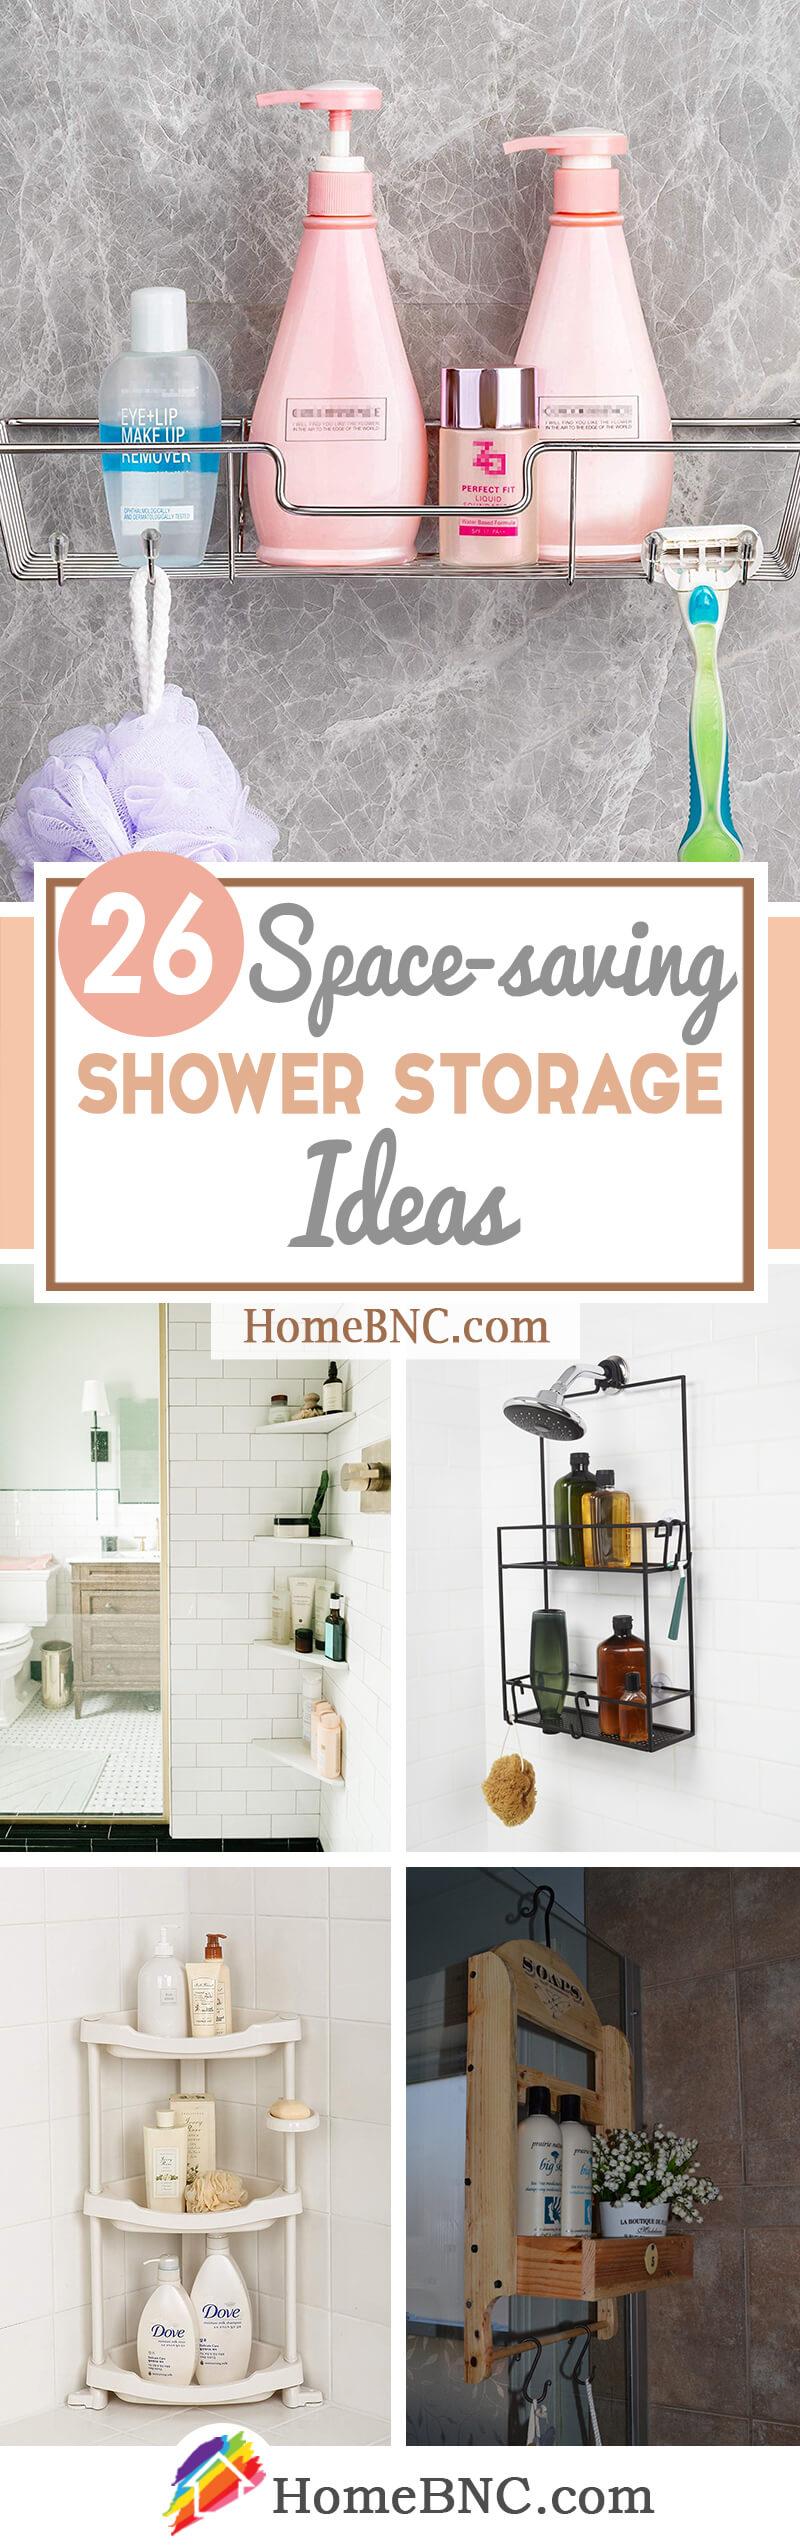 26 Best Shower Storage Ideas To Improve Your Bathroom In 2021